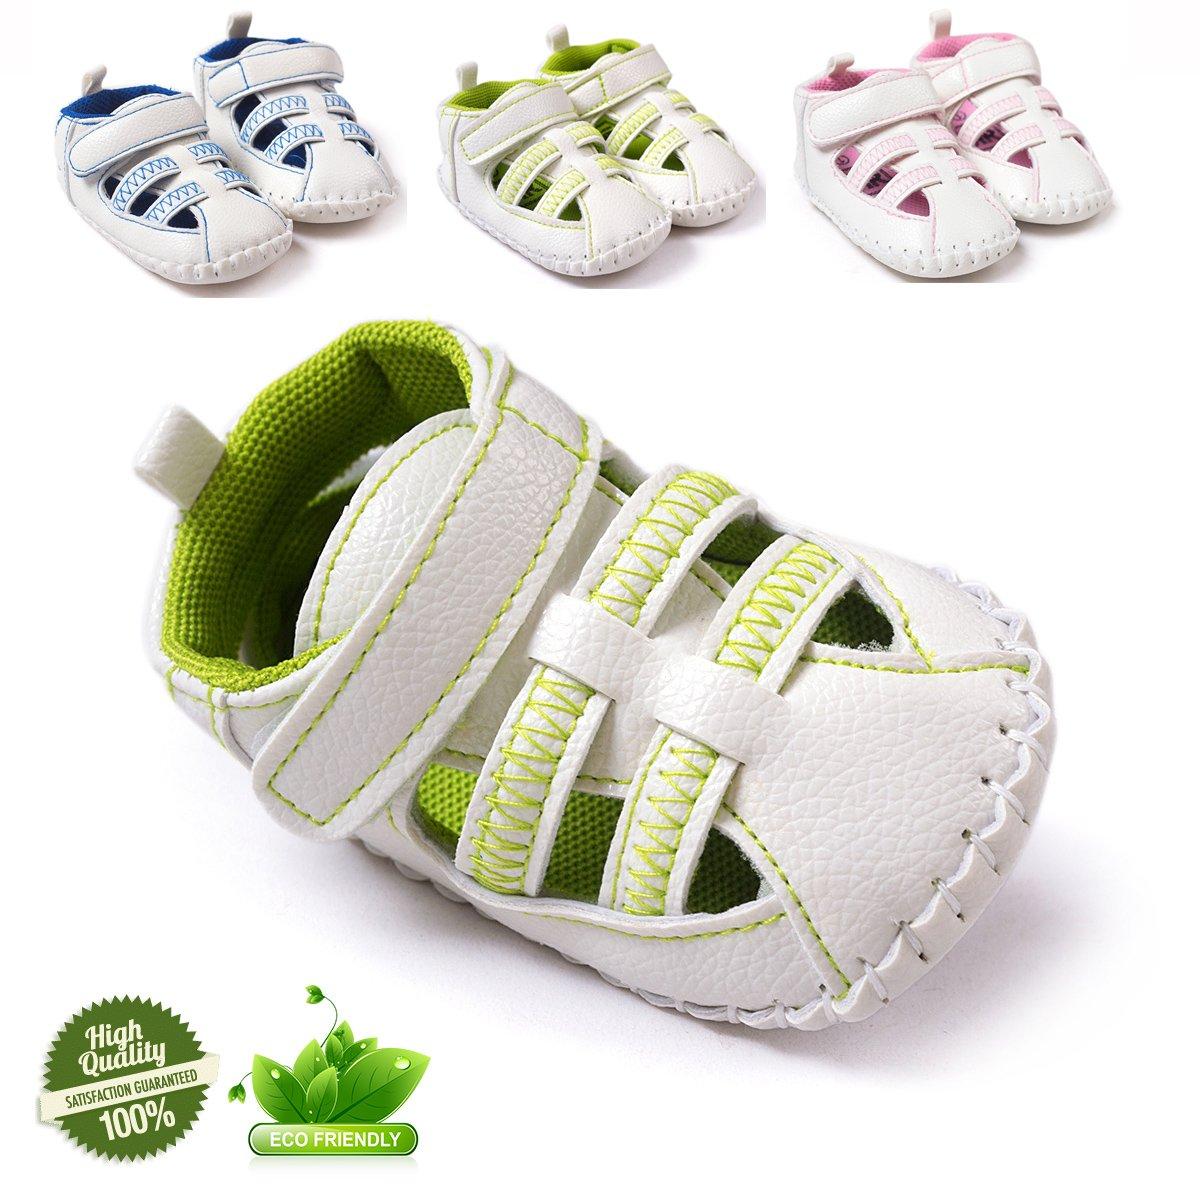 Zapatos de Bebé, Morbuy Unisexo Zapatos Bebe Primeros Pasos Recién Nacido 0-18 Mes Bebé Casual Zapatos Suela Zapatillas Antideslizante Sandalias (11cm / 0-6meses, Azul)